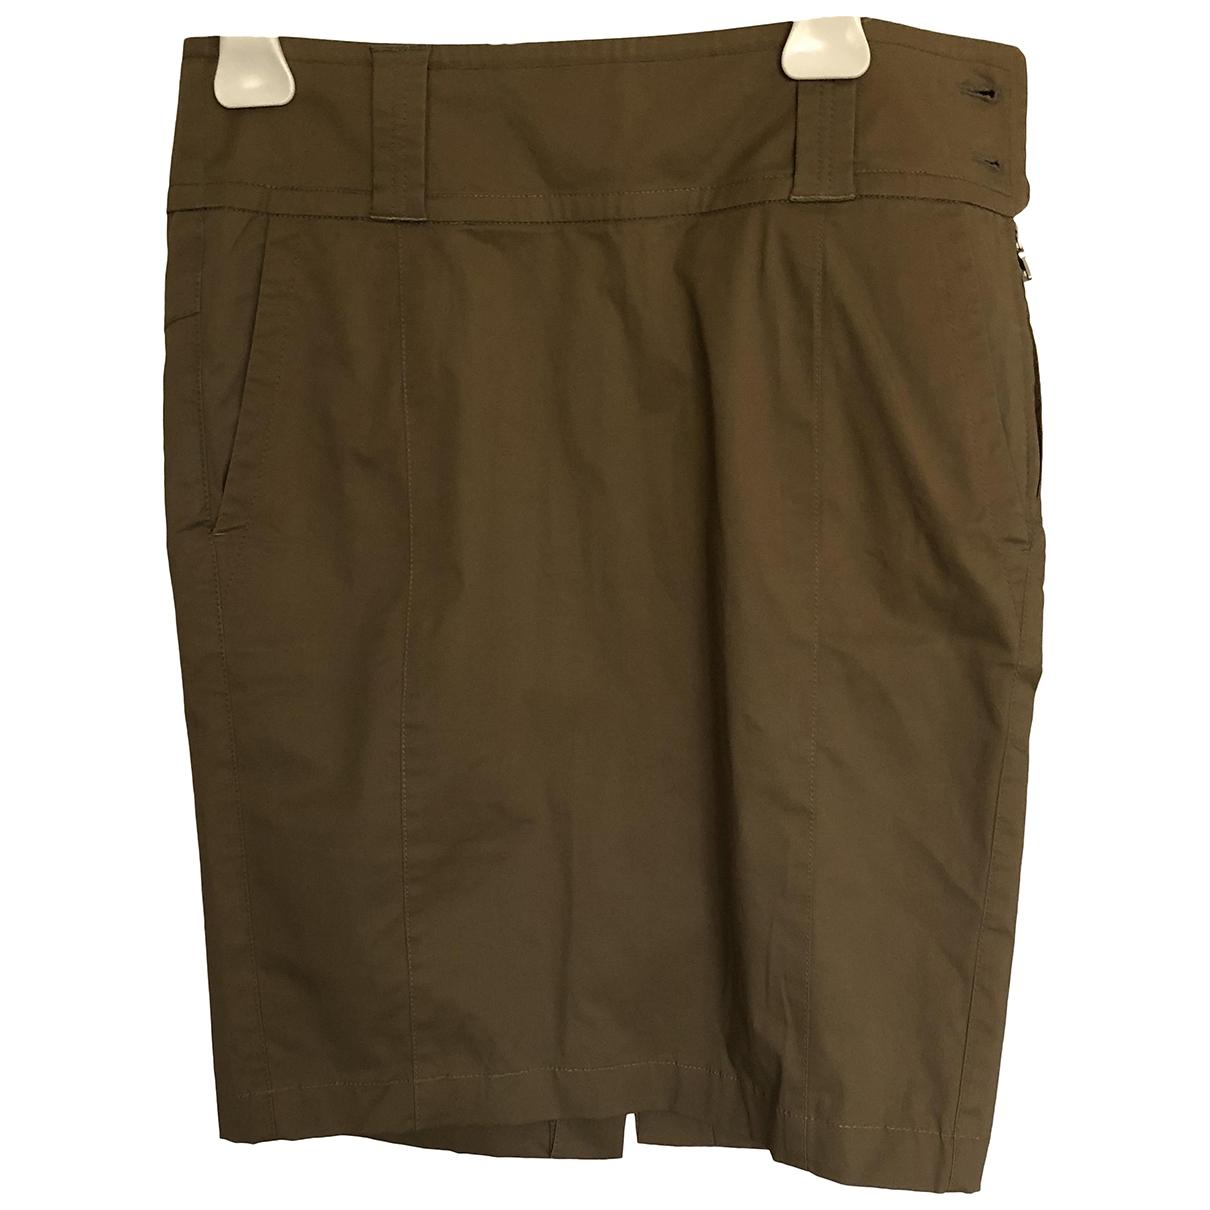 Prada \N Beige Cotton skirt for Women 38 IT